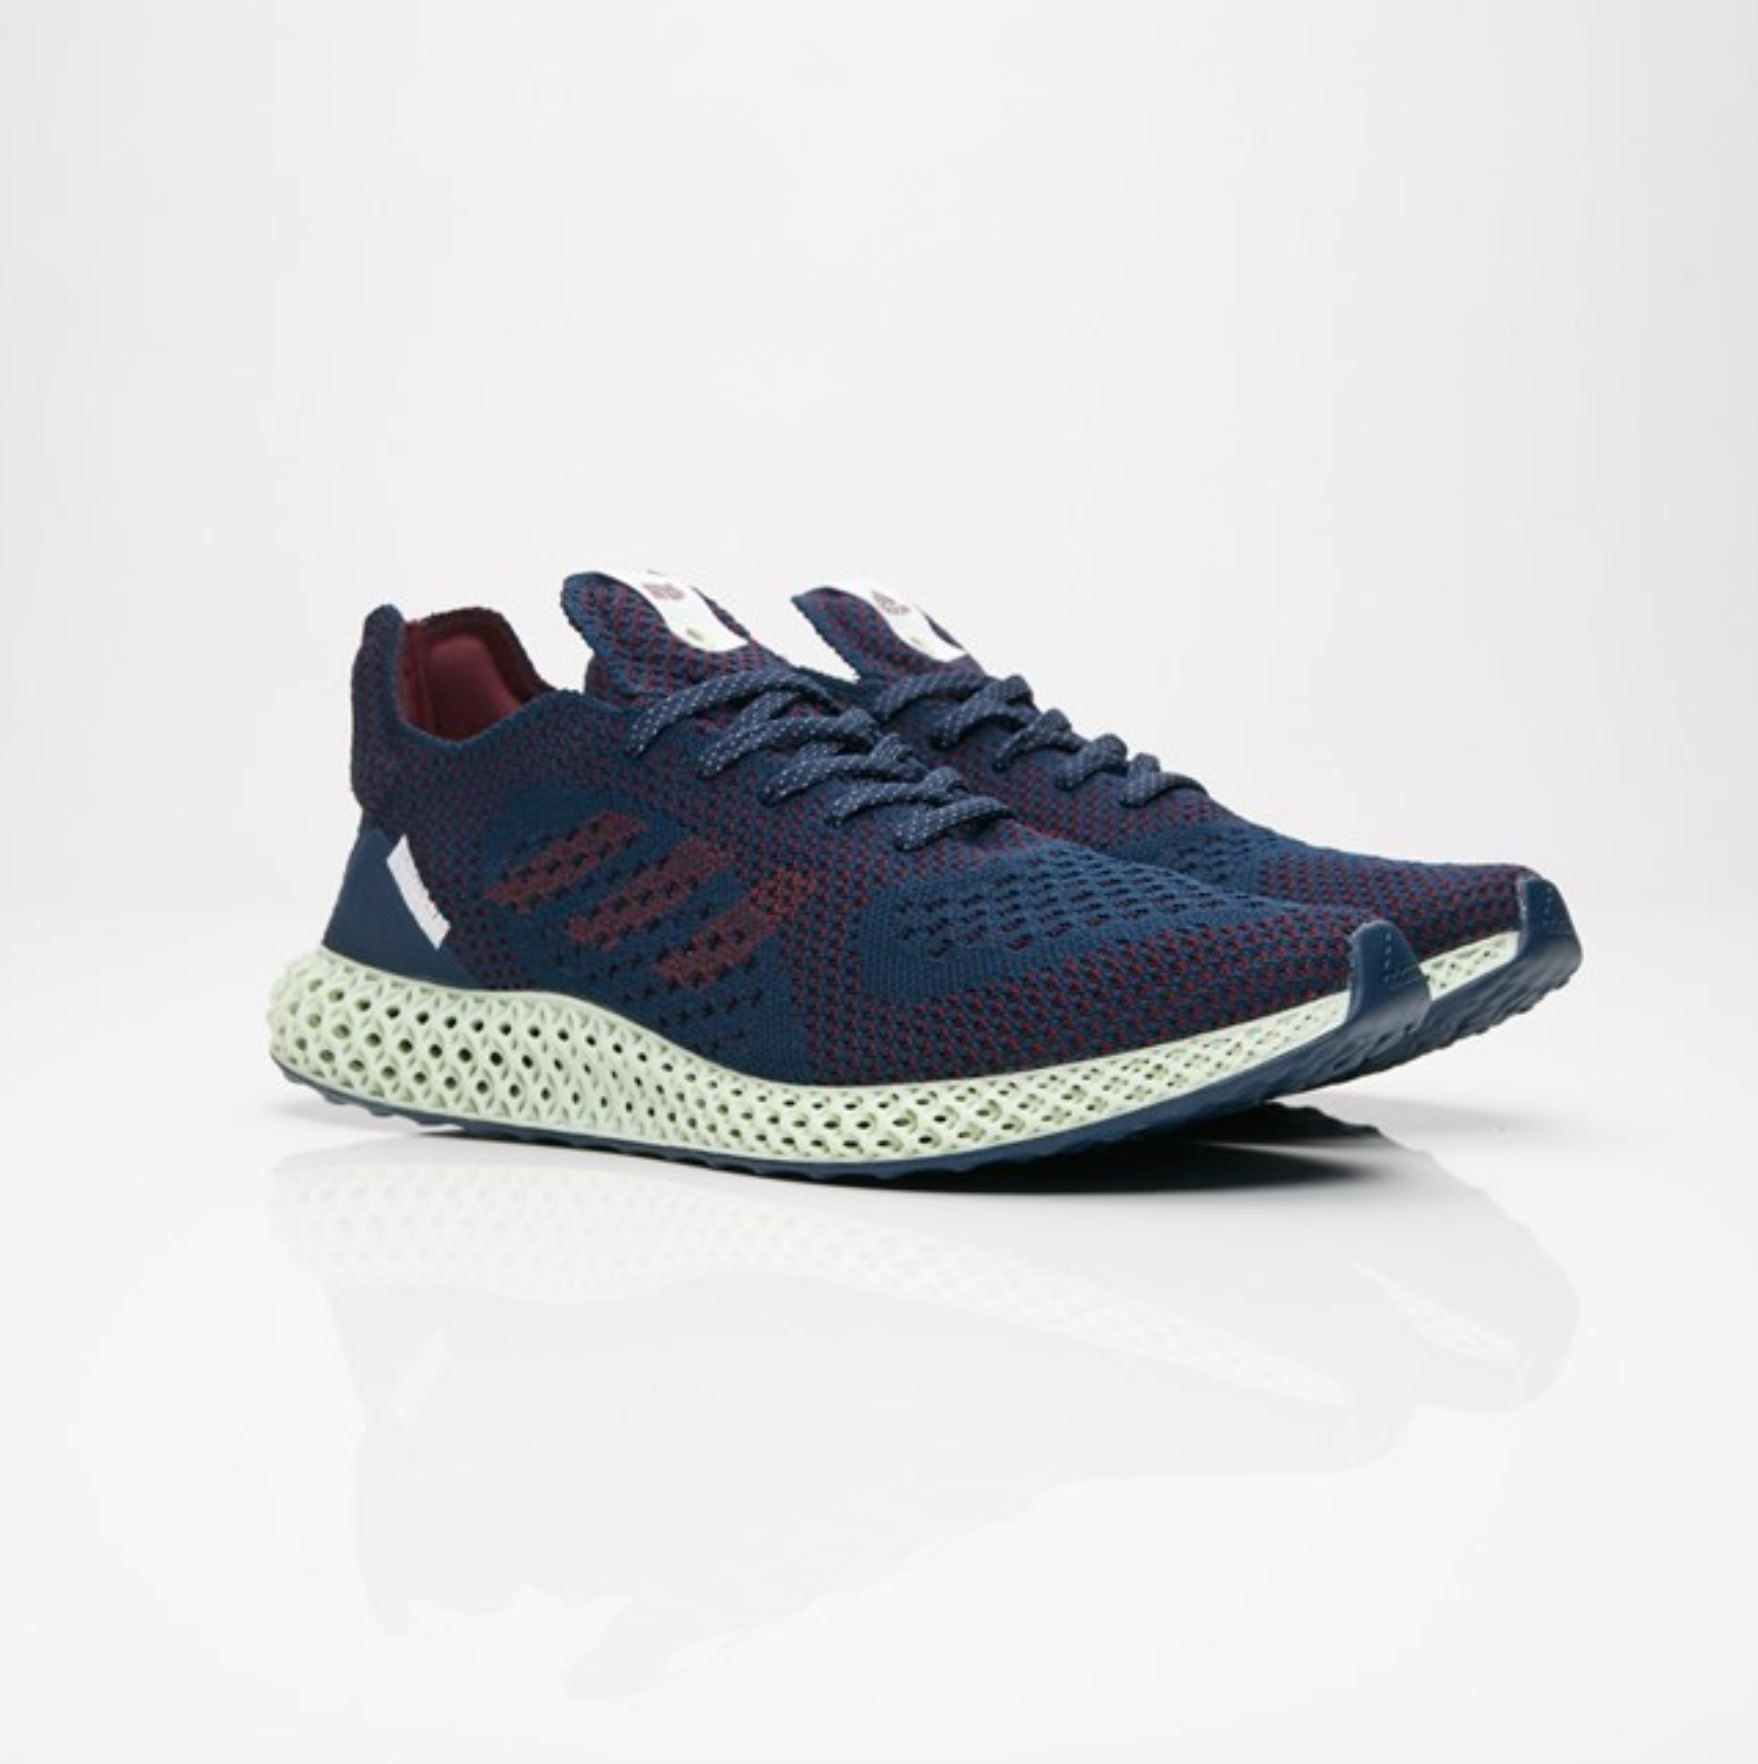 sneakersnstuff adidas consortium 4D